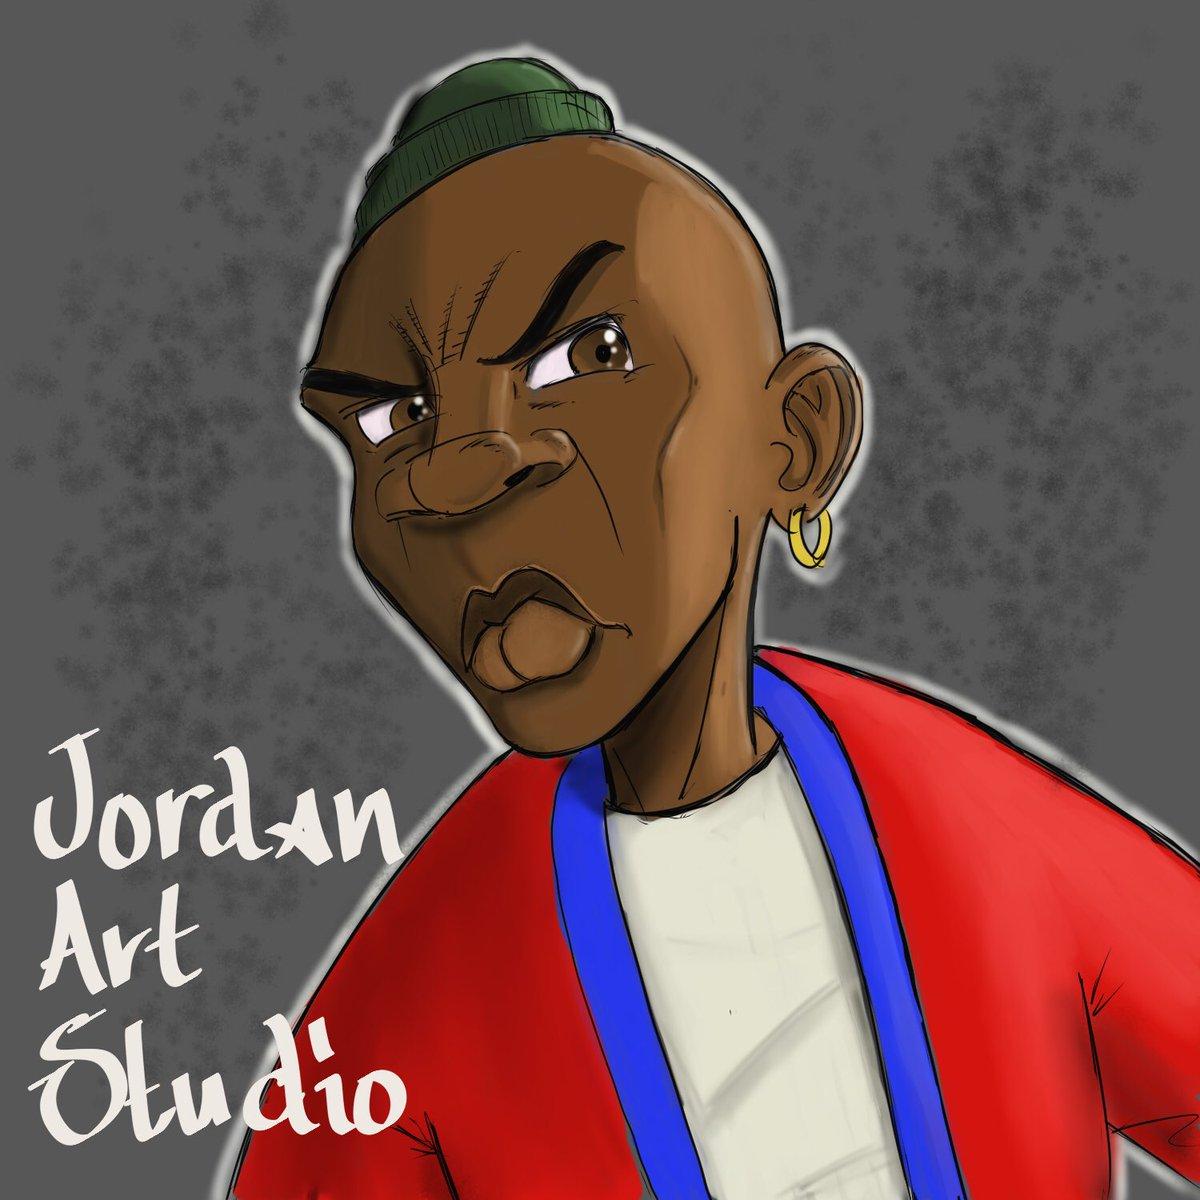 Da F*ck You Looking At? #art #blackart #blackartist #blackcharacters #representation #jordan #artstudio #gonepro #thisiswhatido #forusbyus  #doingforself #theglovescomeoff<br>http://pic.twitter.com/kKBGqR24vB